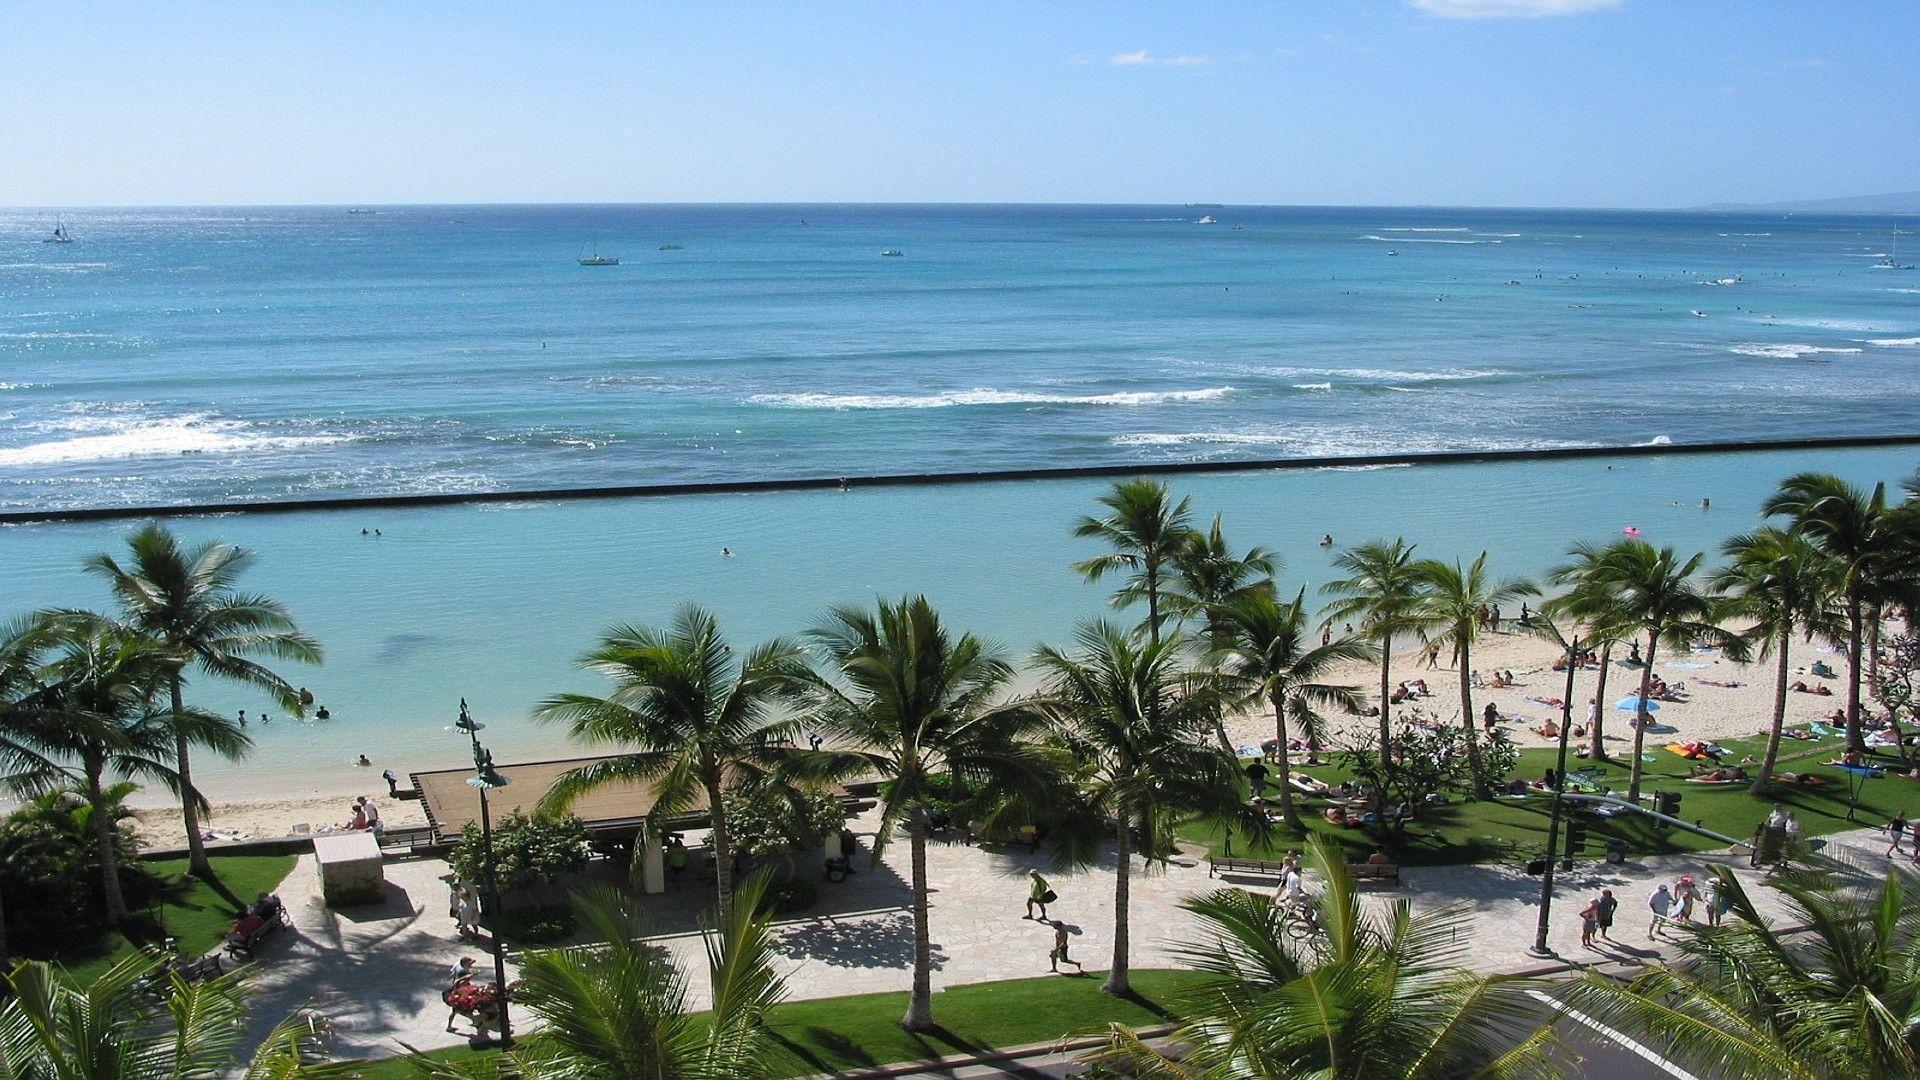 Waikiki Wallpaper: Waikiki Beach Wallpapers